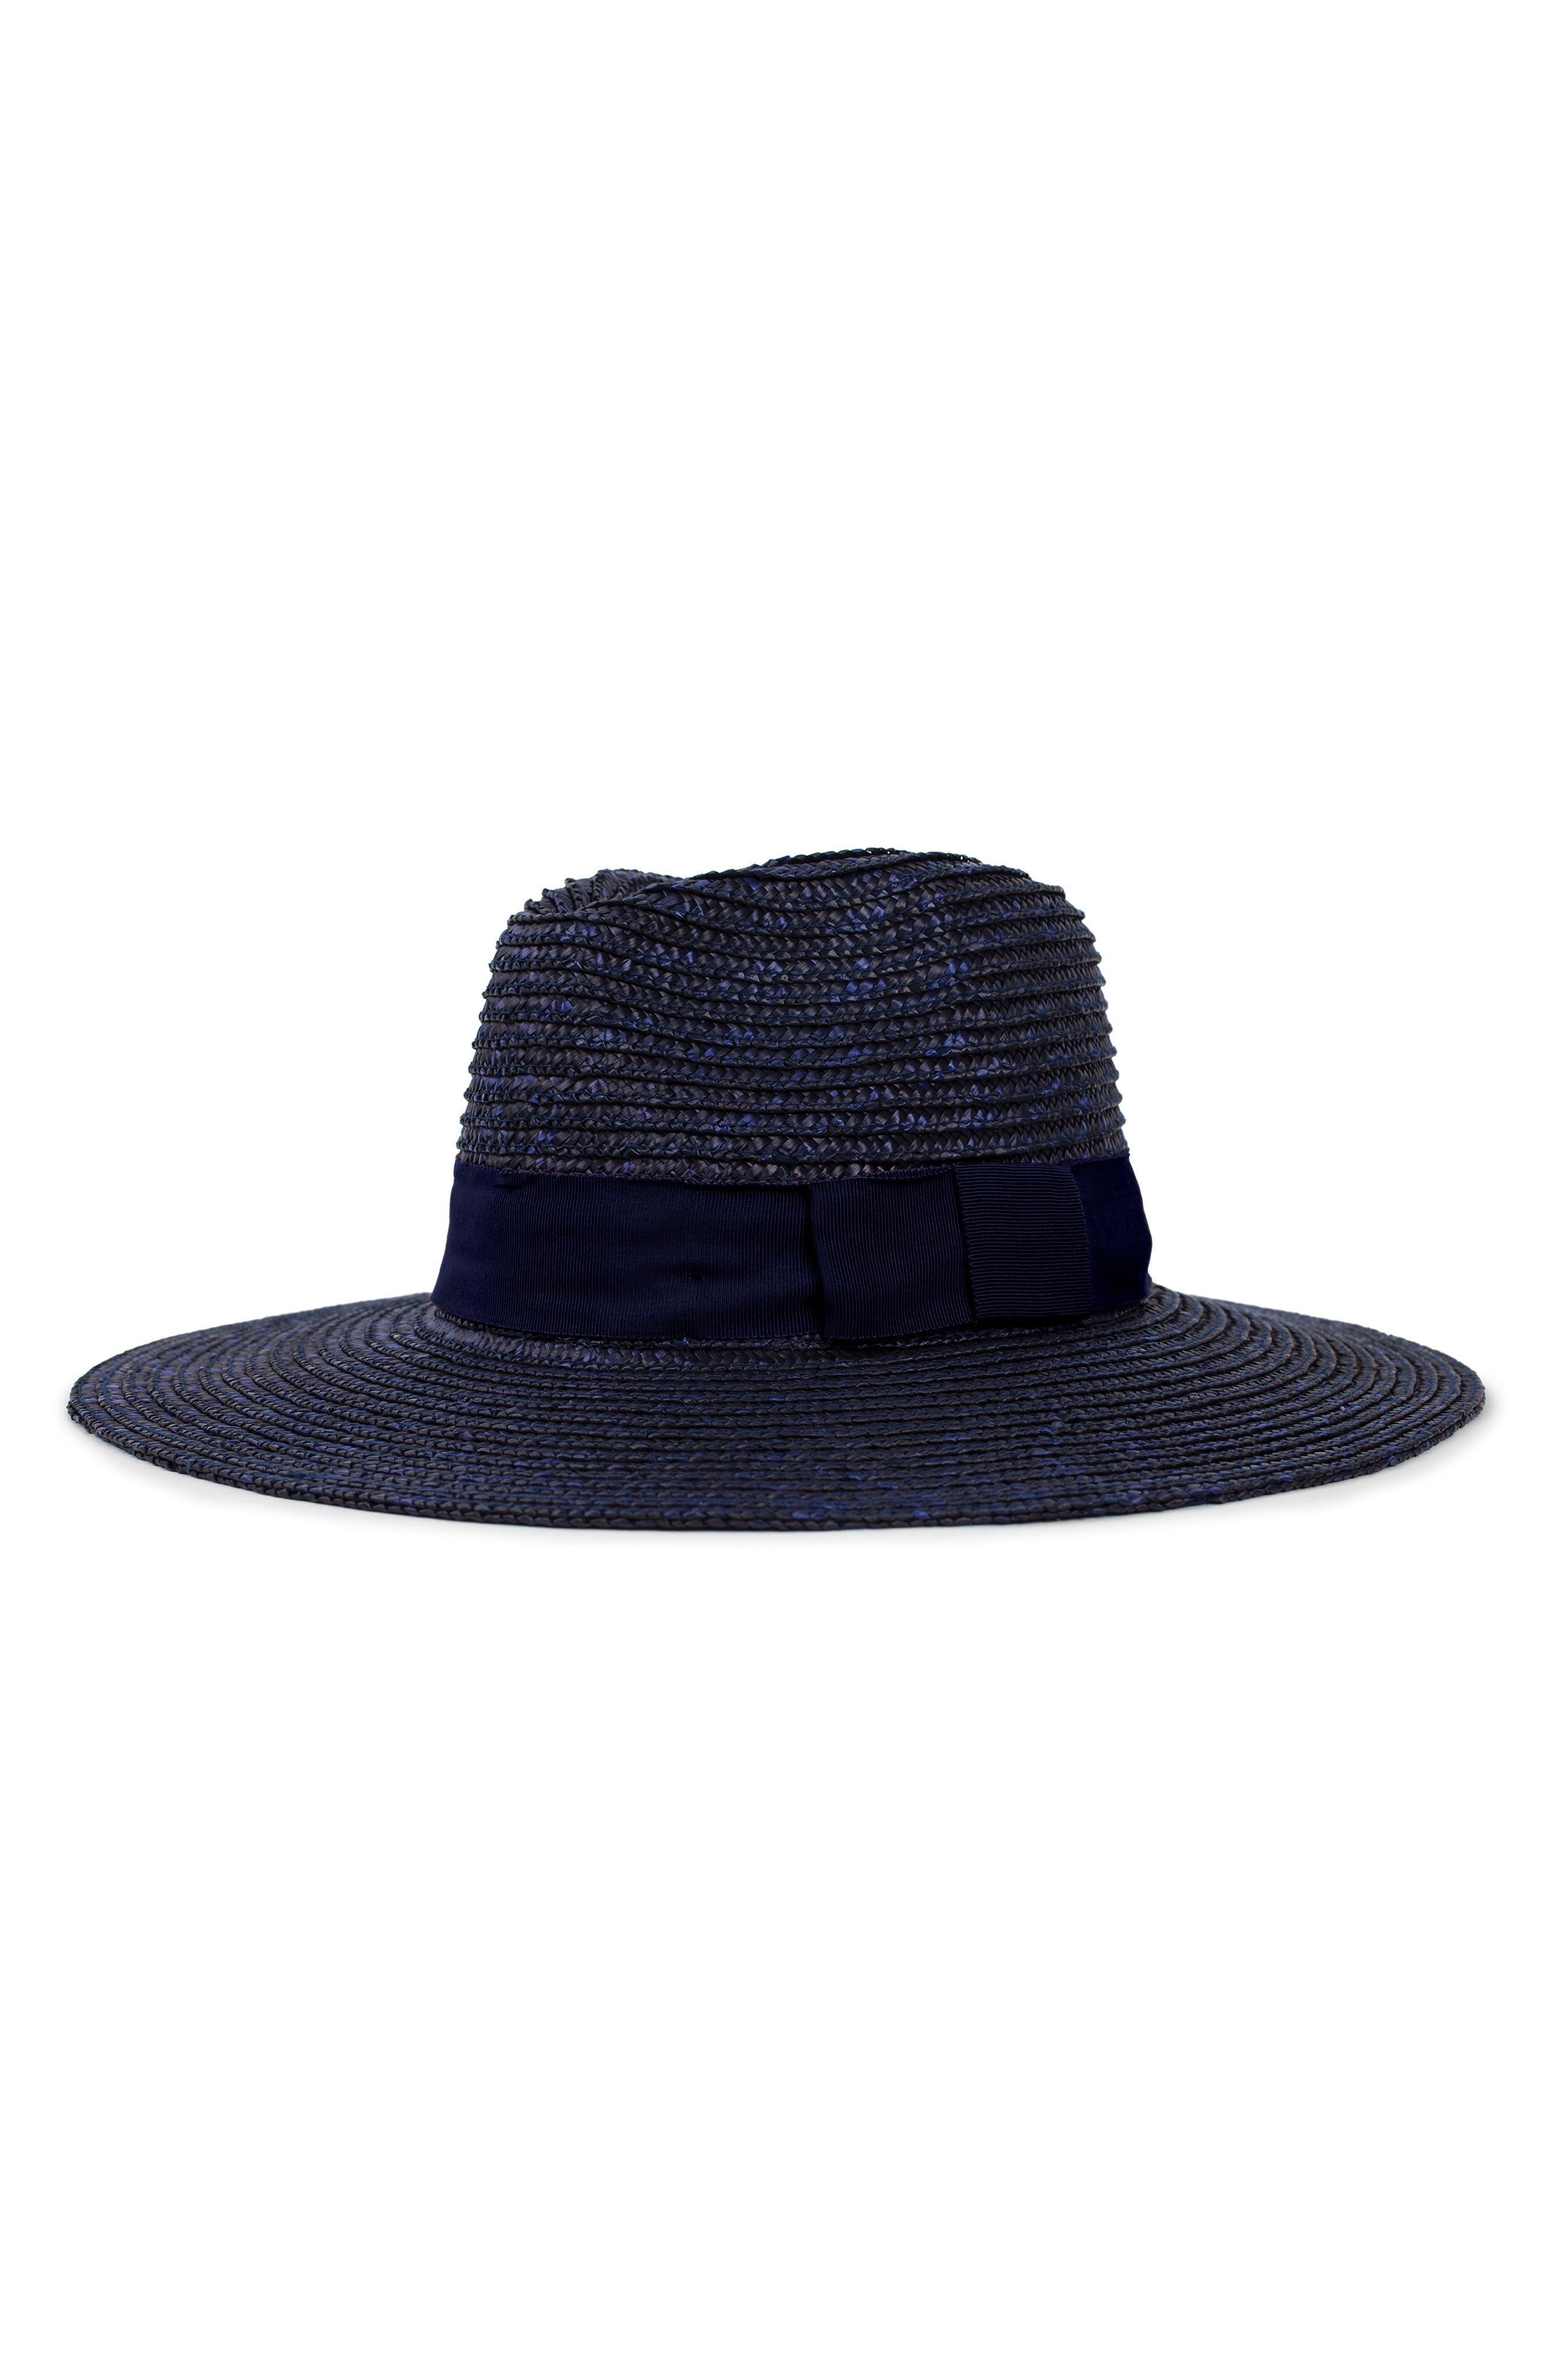 'Joanna' Straw Hat,                         Main,                         color, MIDNIGHT